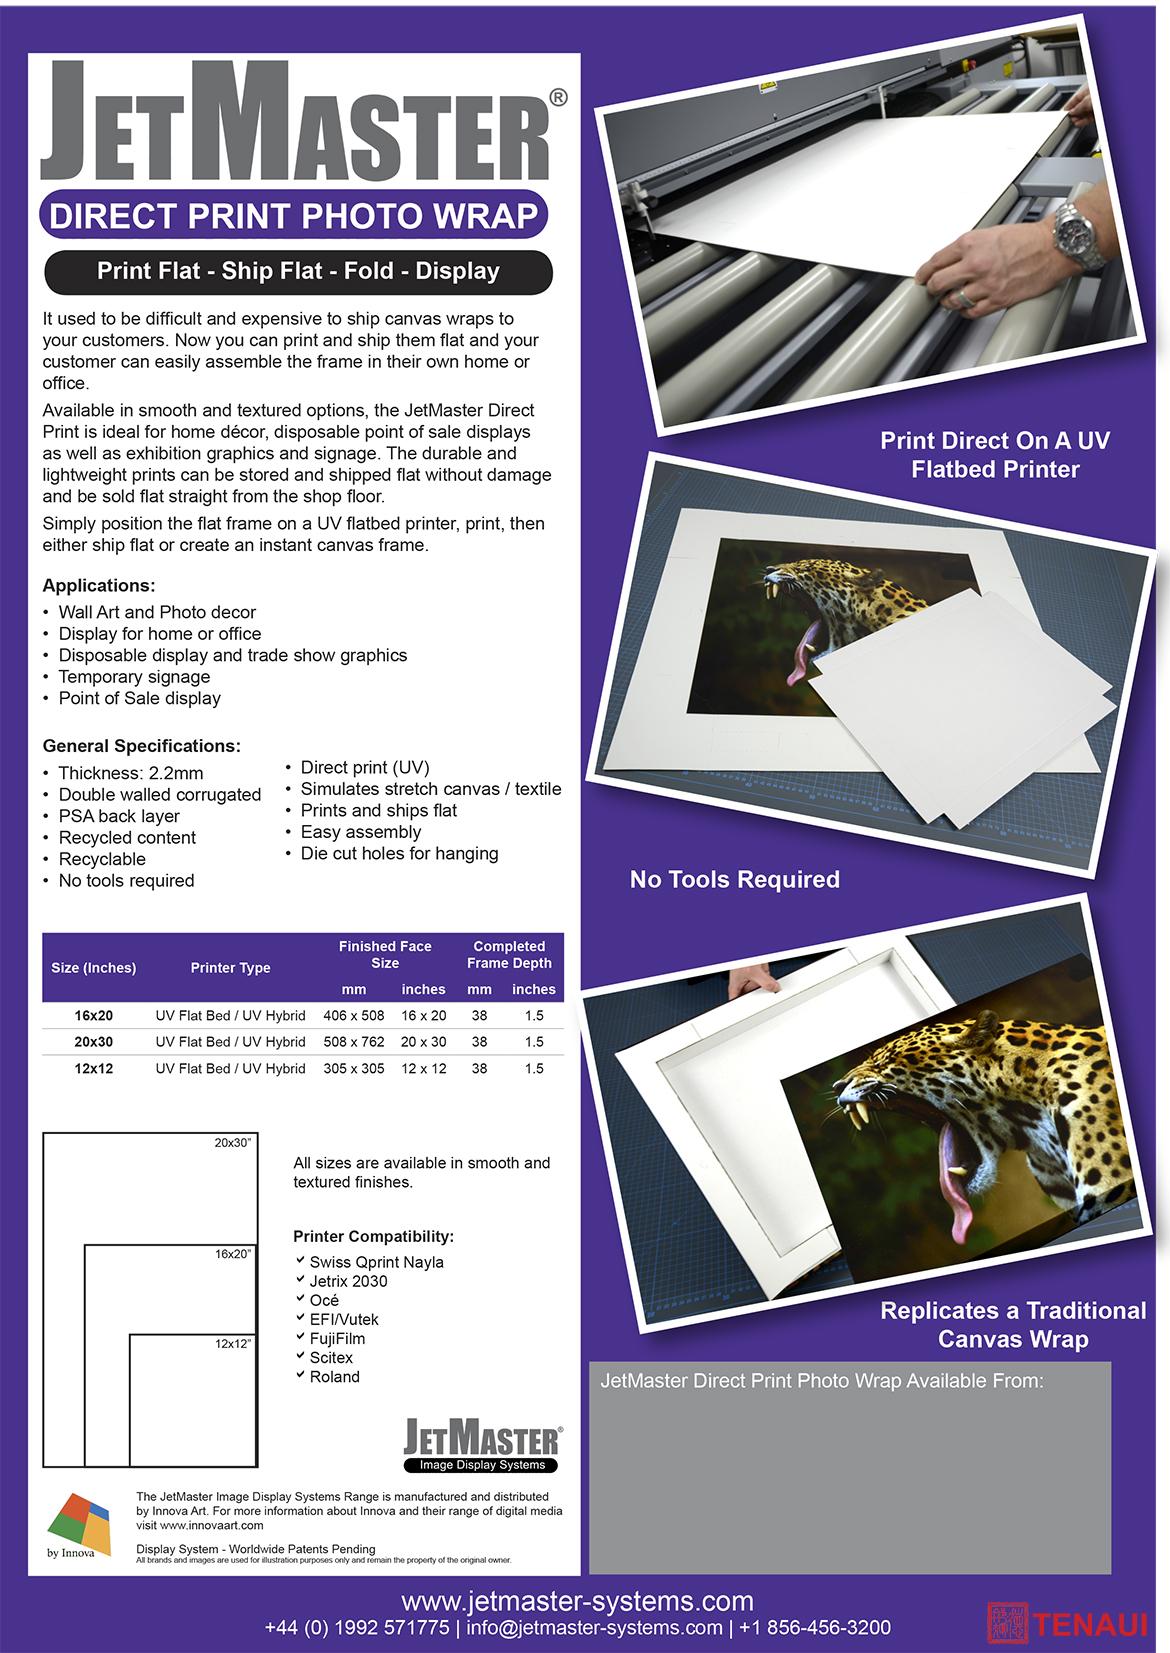 jetmaster-direct-print-photo-wrap-tenaui1